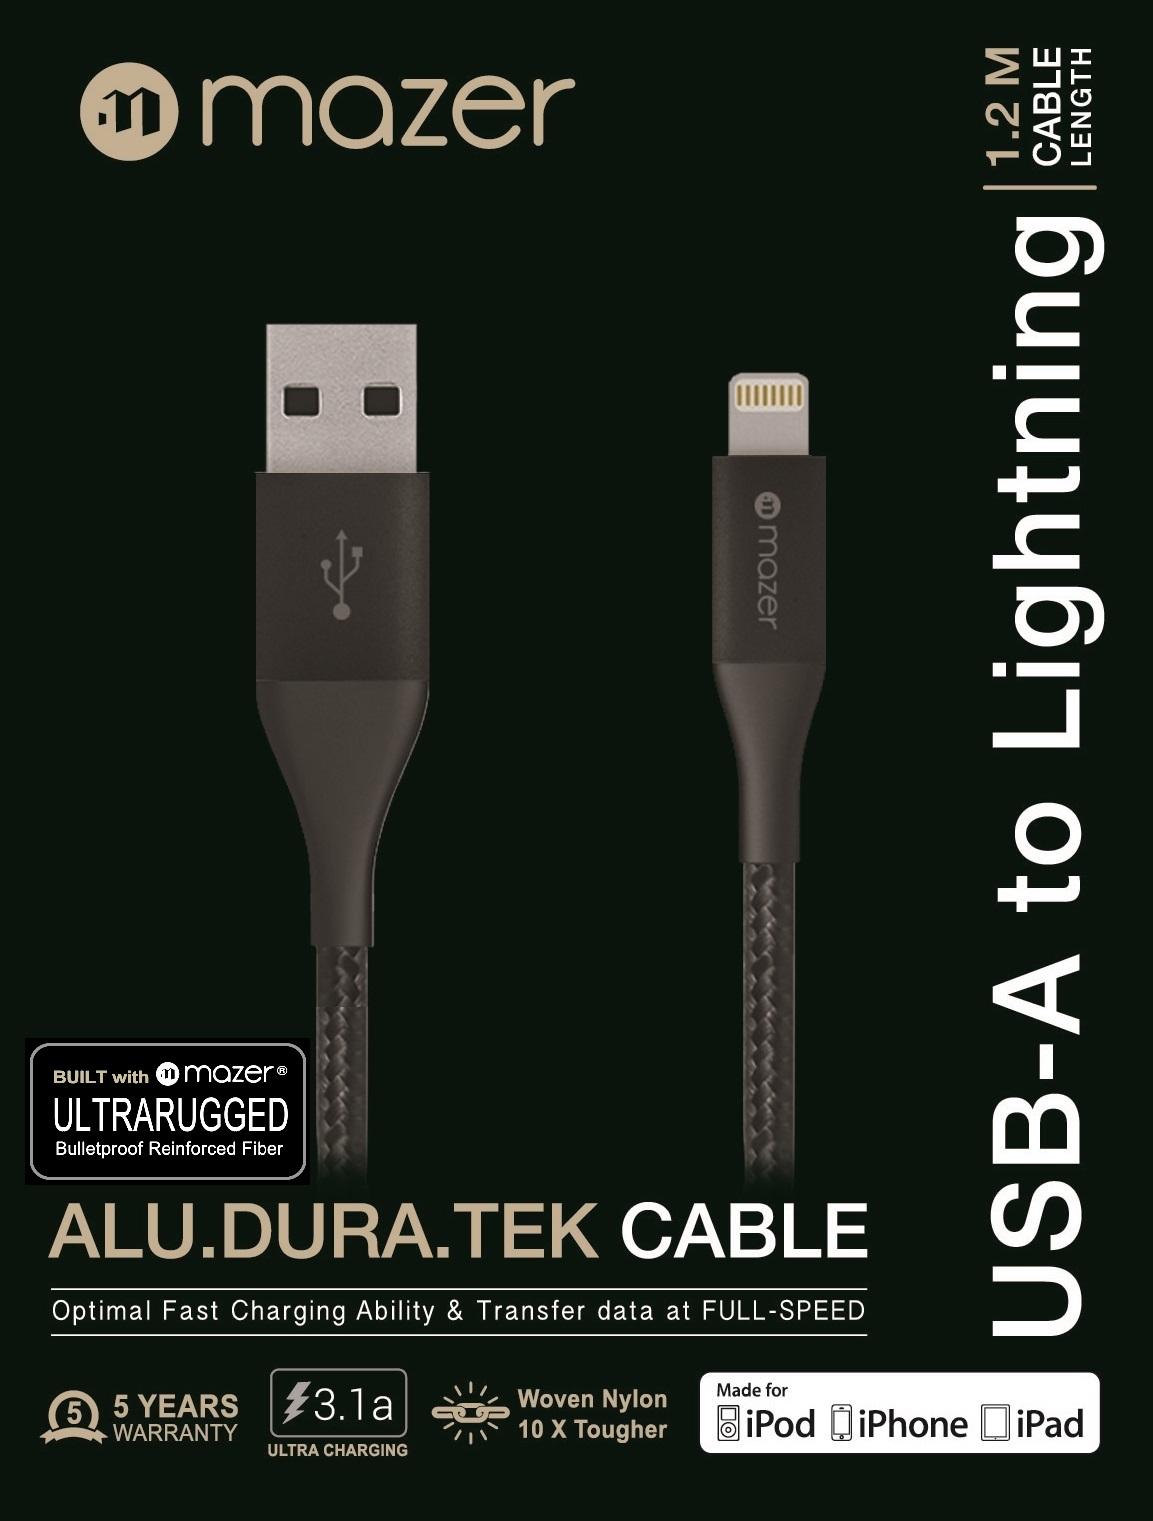 Cáp MAZER CBL MFI USB A TO LIGHTNING / 3.1A (1.2M)